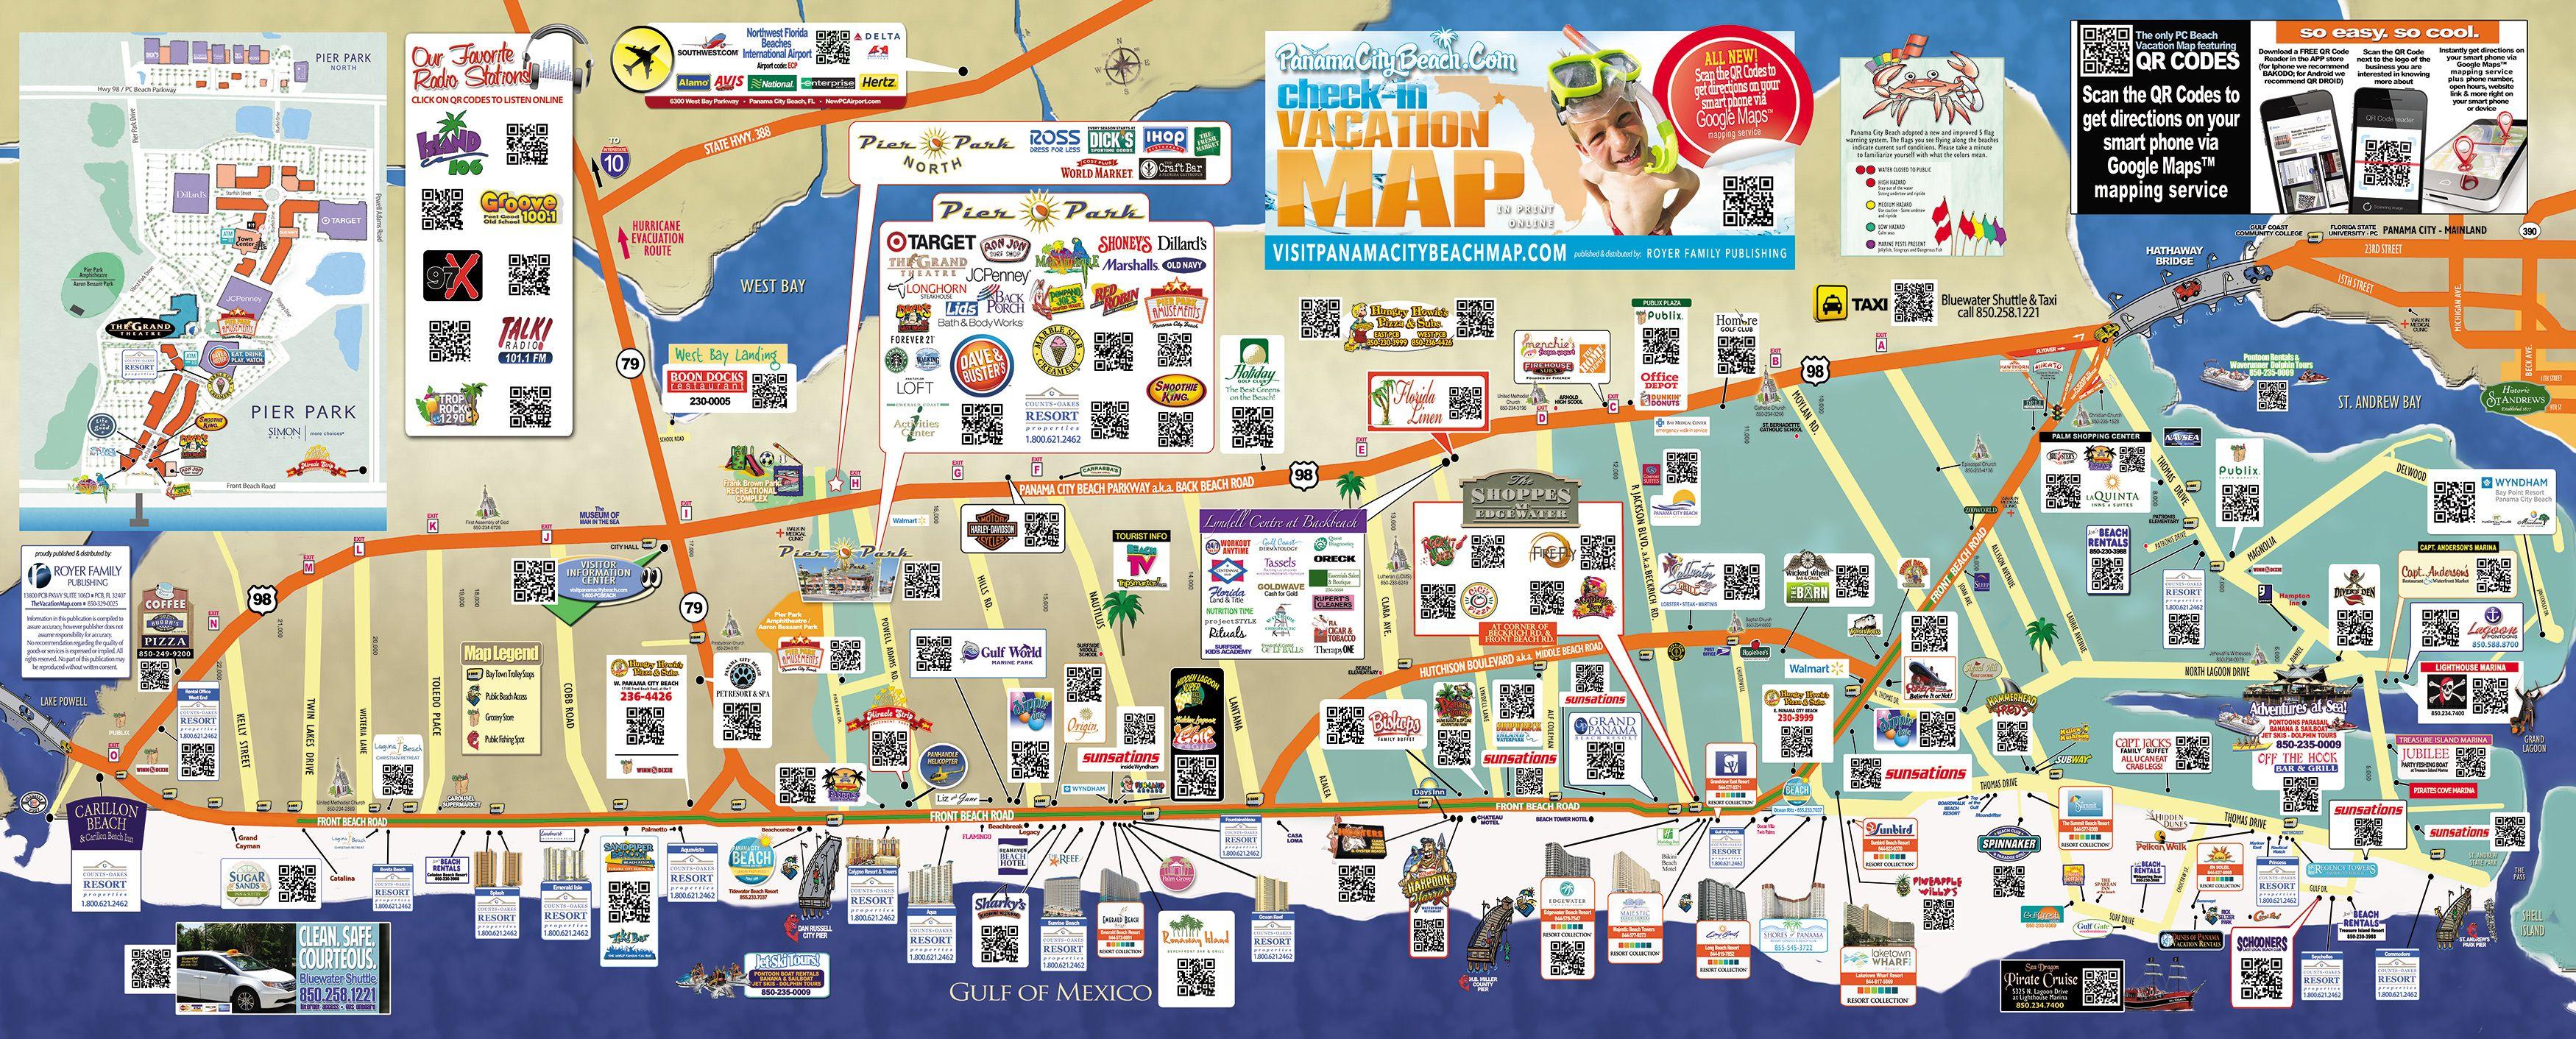 Tourist Map Of Panama City Beach | To The Beach! | Pinterest - Panama Beach Florida Map